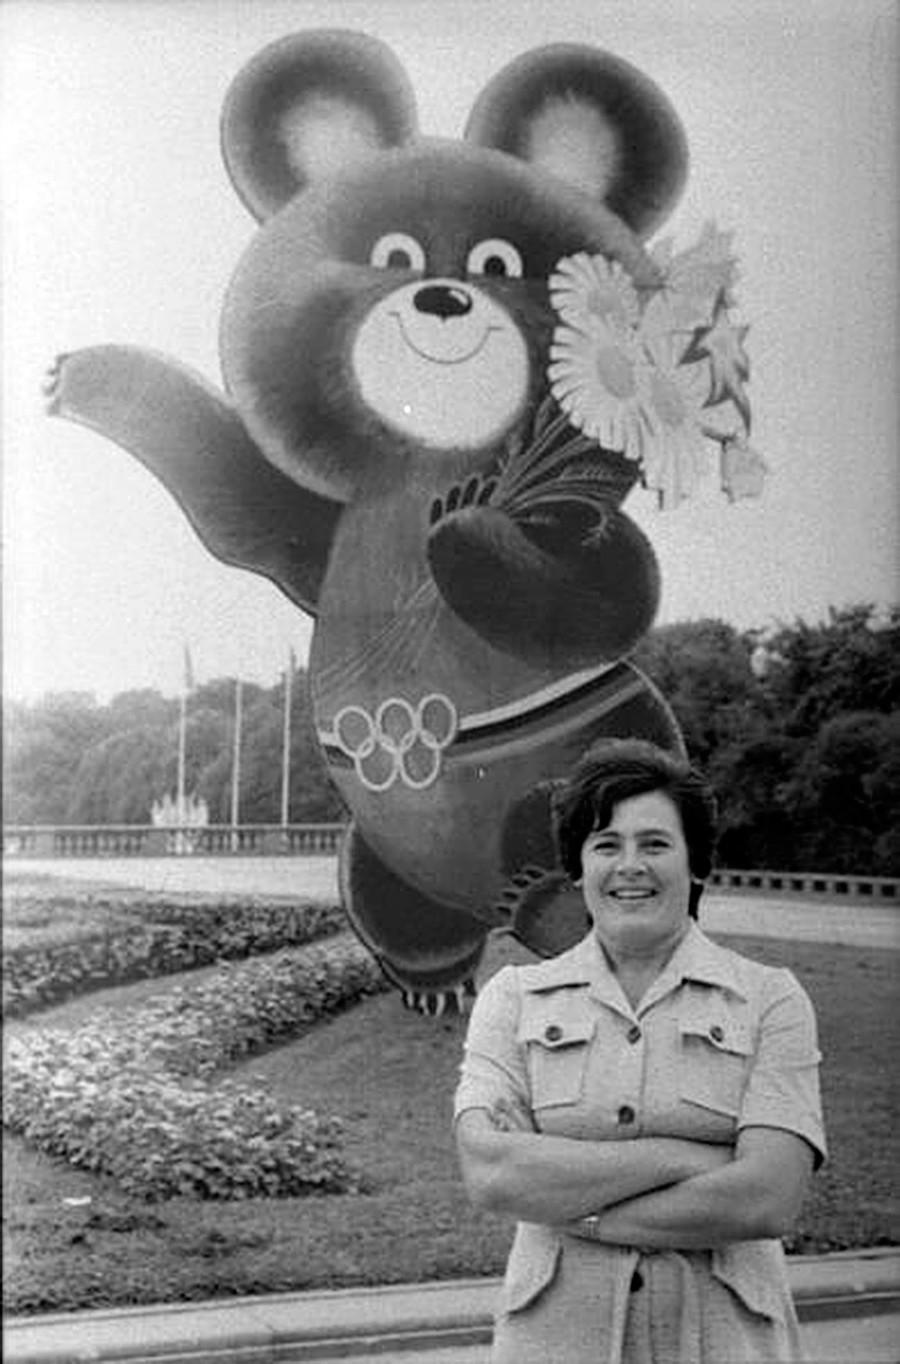 Devant Mishka, mascotte des JO de Moscou en 1980